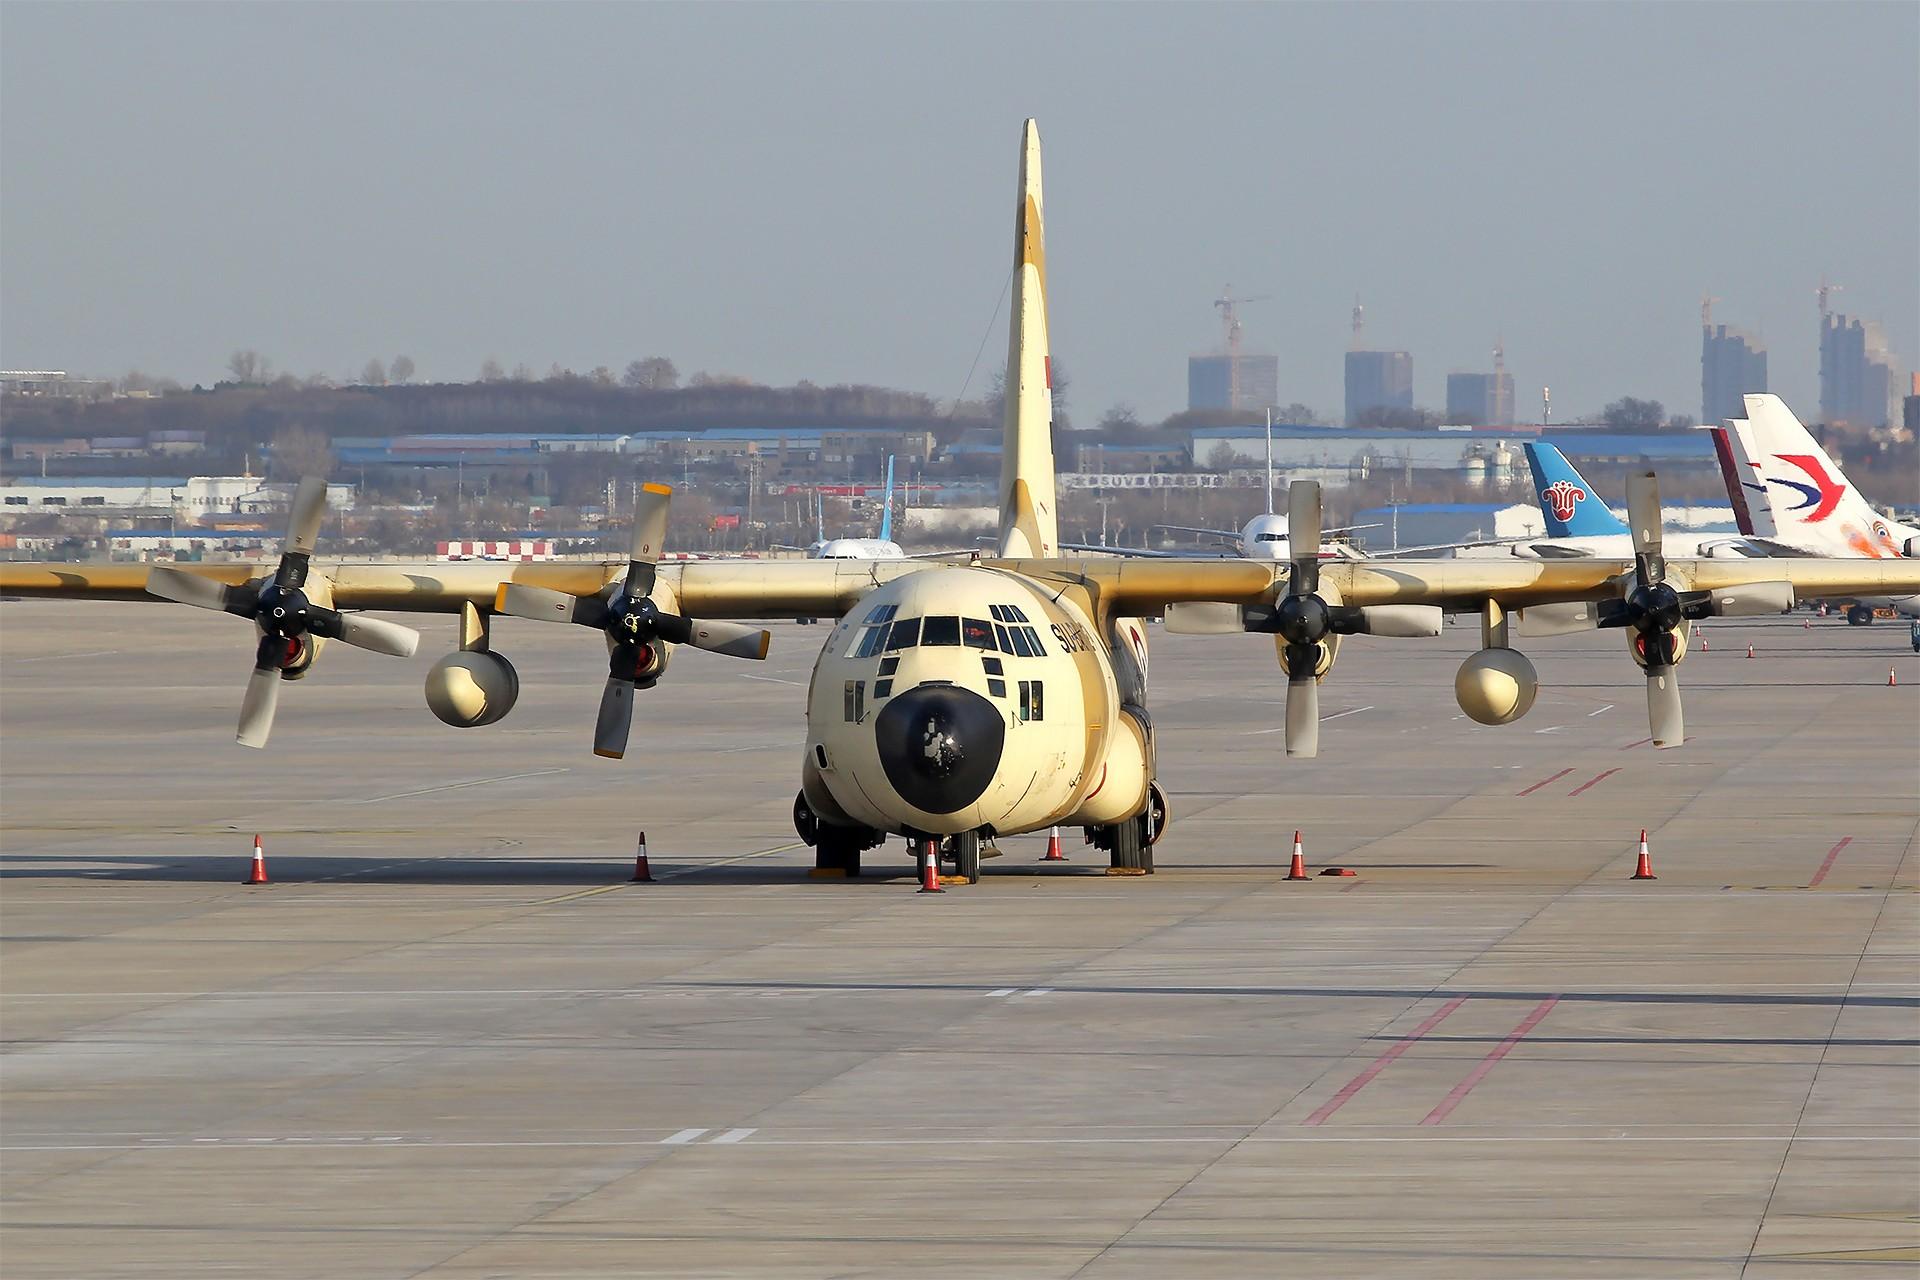 Re:[原创][DLC]。。。埃及空军C130。。。 LOCKHEED C-130H HERCULES (L-382) 1274/SU-BAE 中国大连国际机场